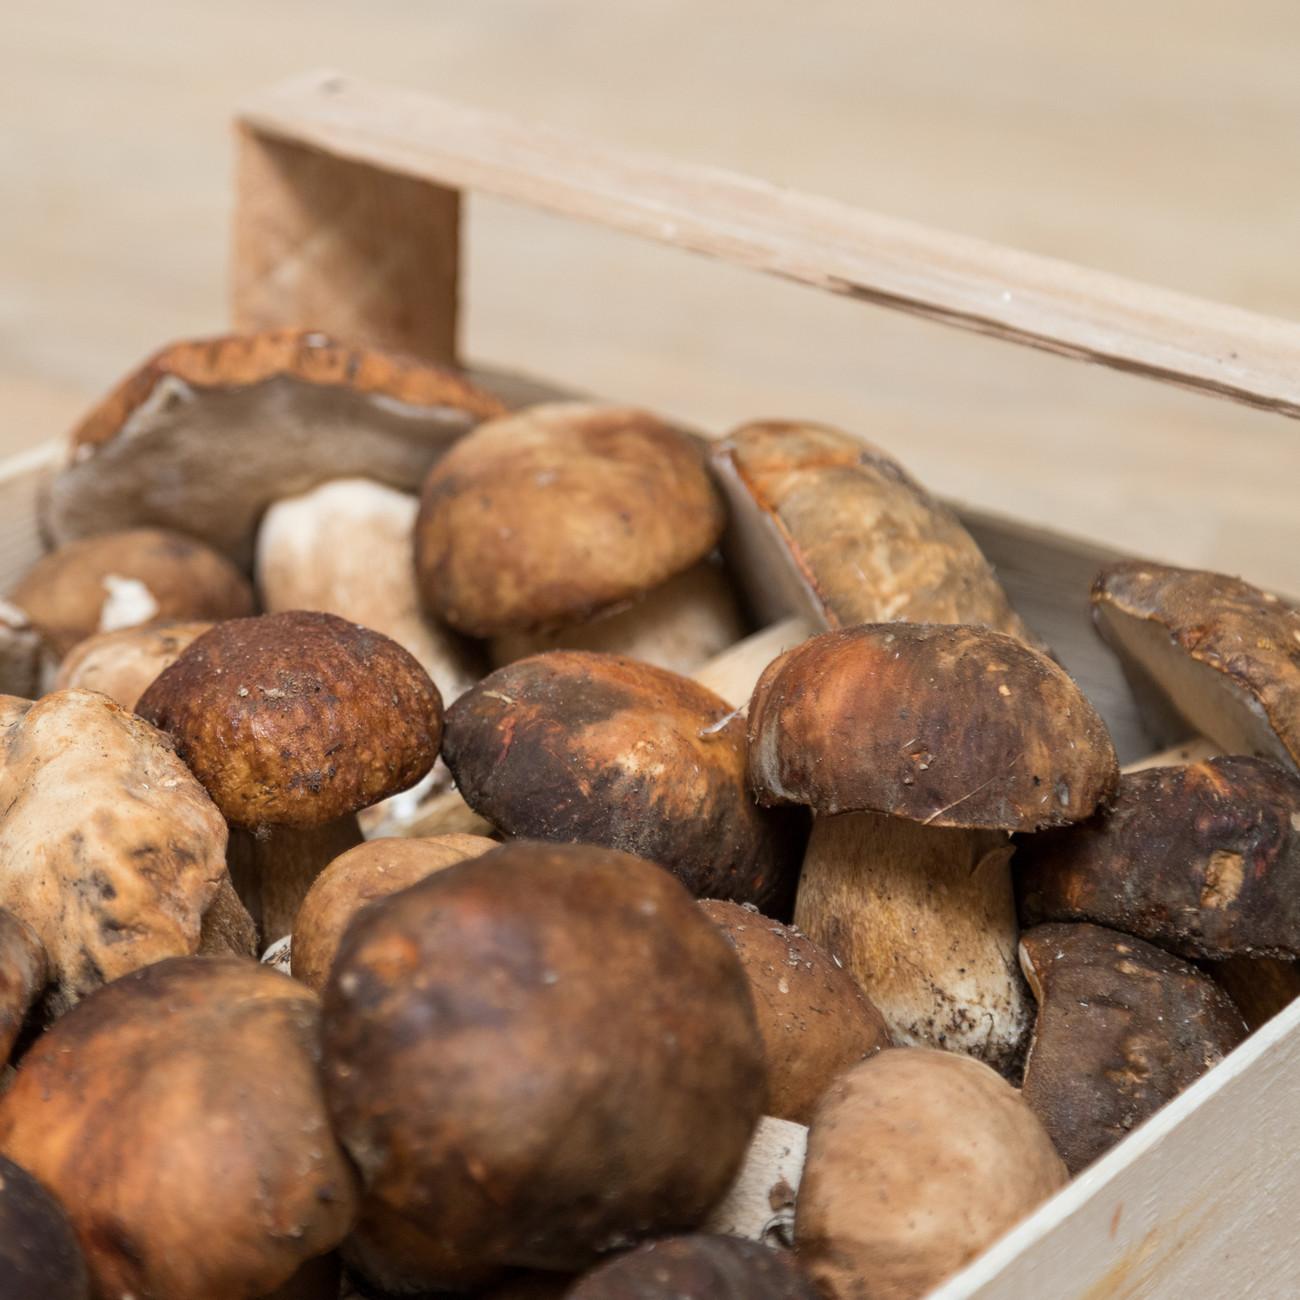 Funghi porcini in Toscana